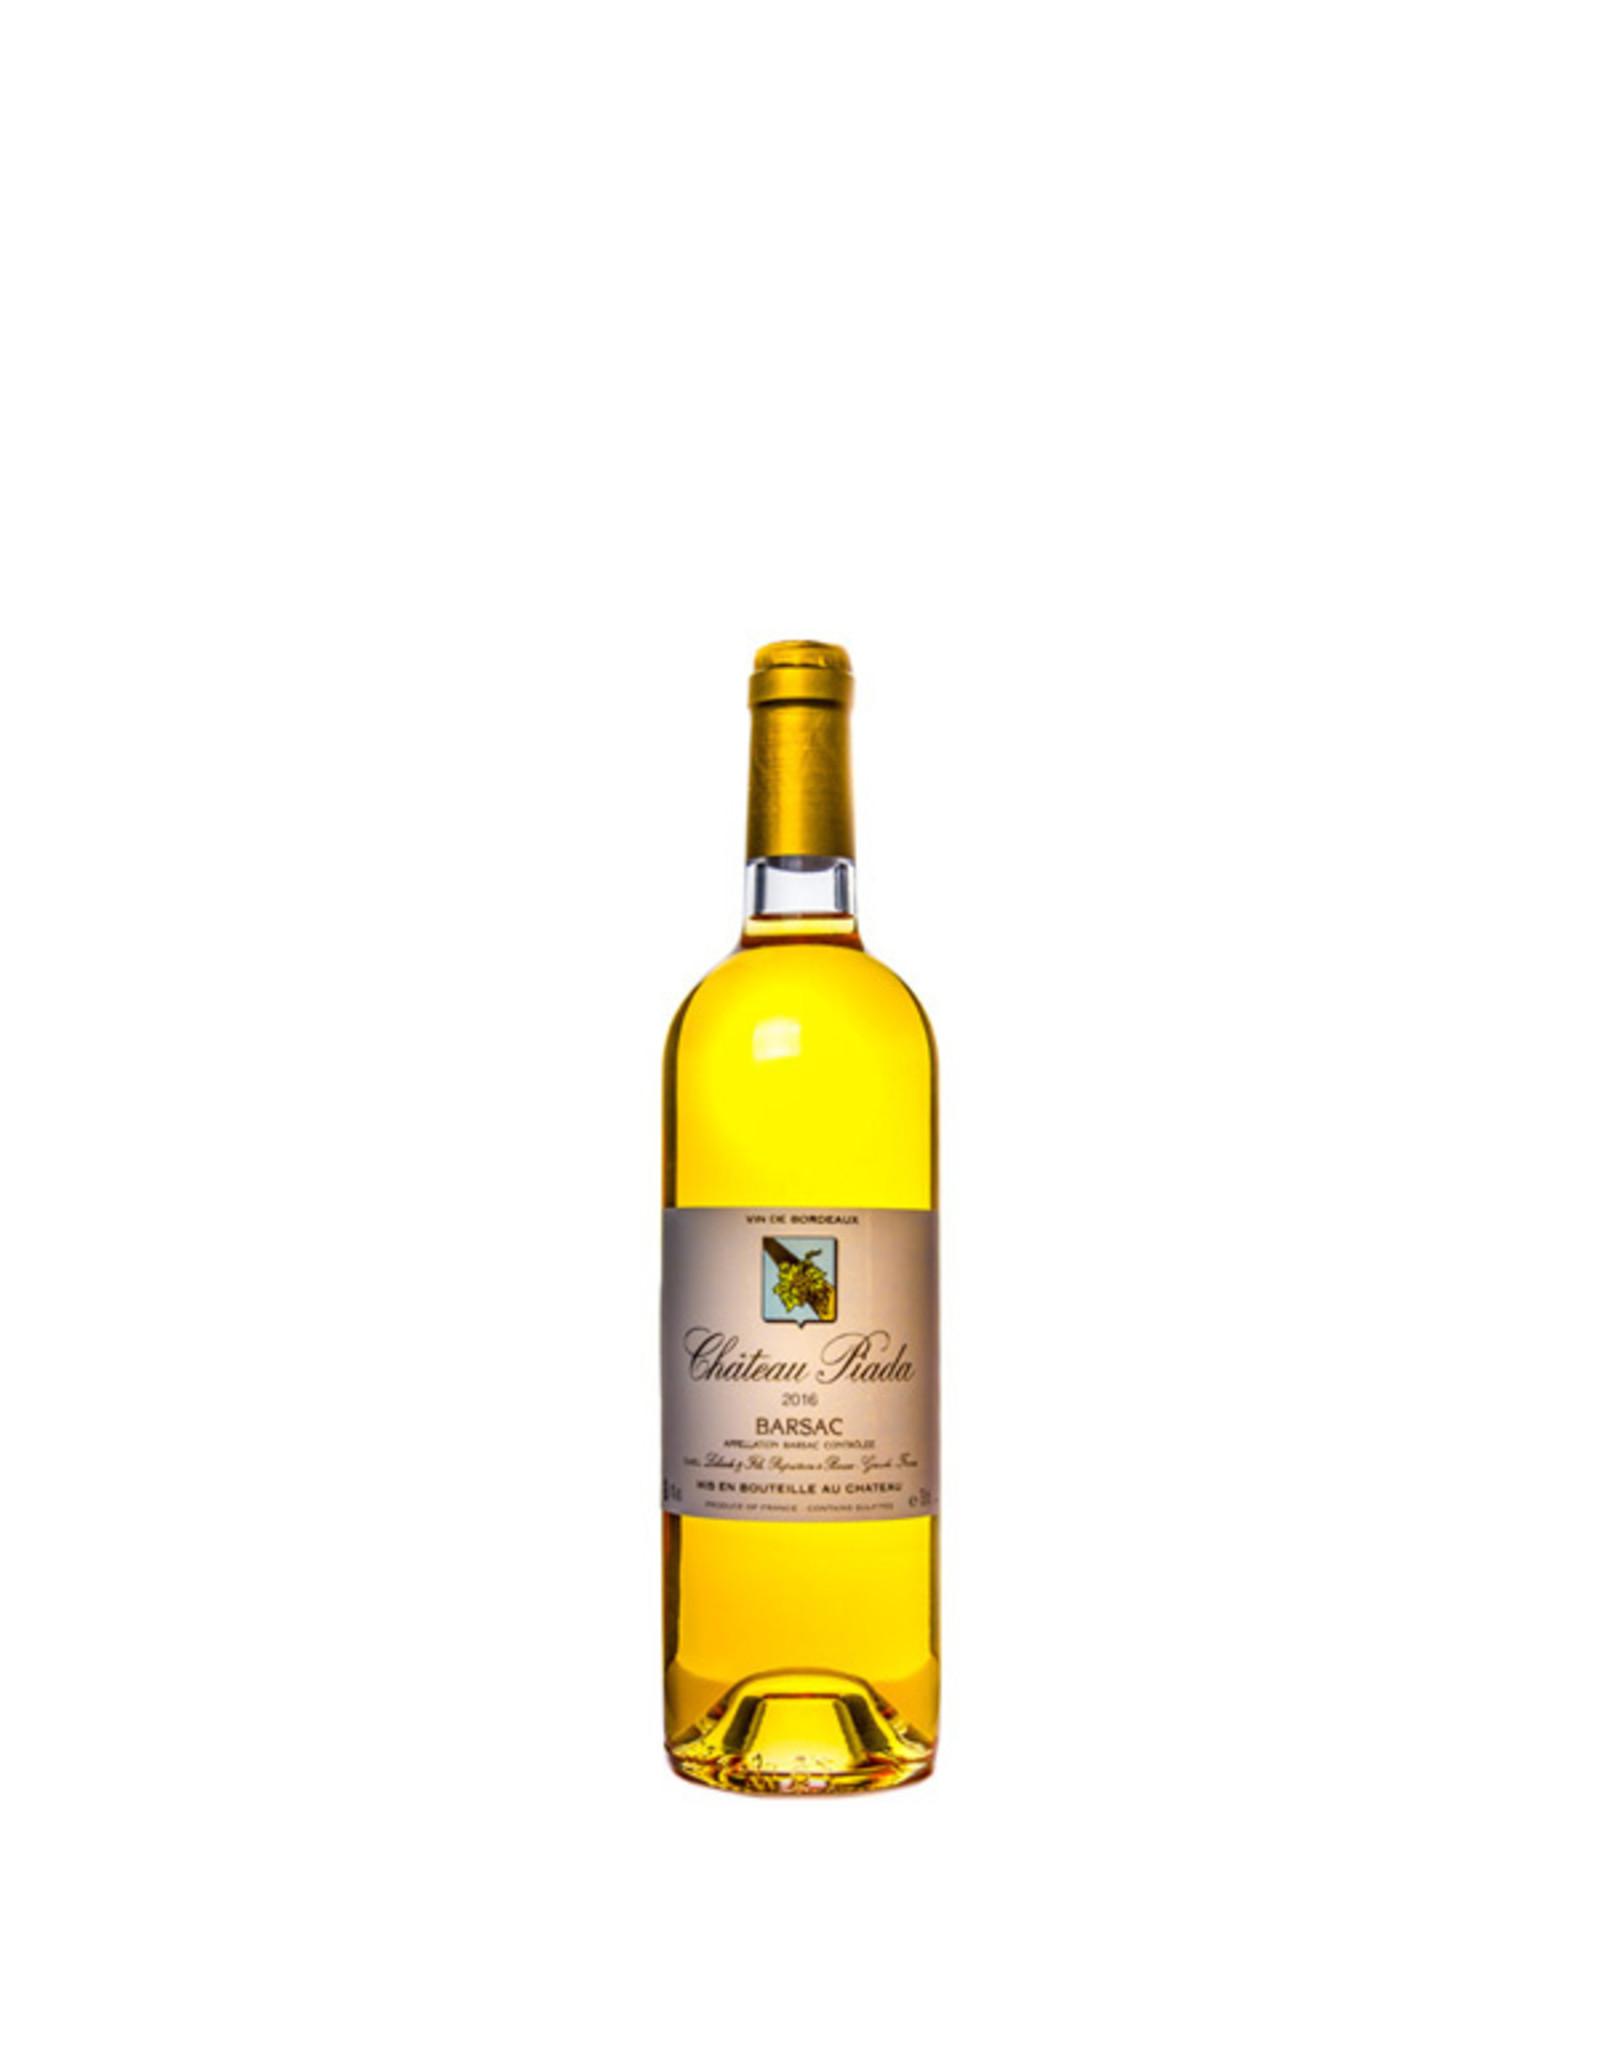 Piada, Sauternes Chateau Piada 2016 halve fles